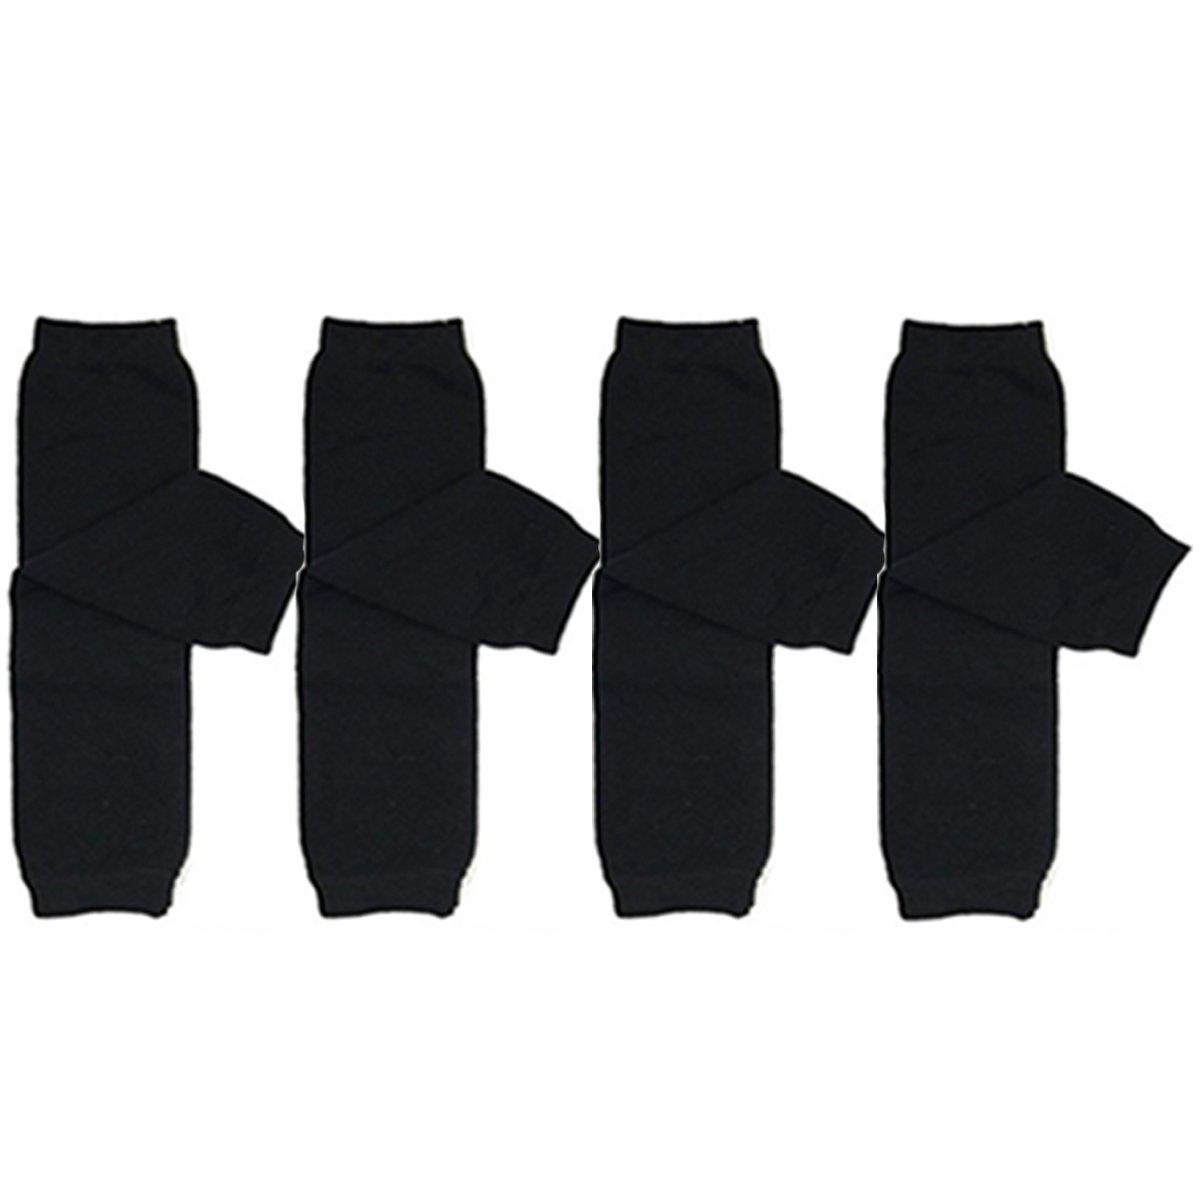 ALLYDREW 4 Pack Solid Baby Leg Warmer Set & Toddler Solid Leg Warmer Set for Boys & Girls (Black) by allydrew